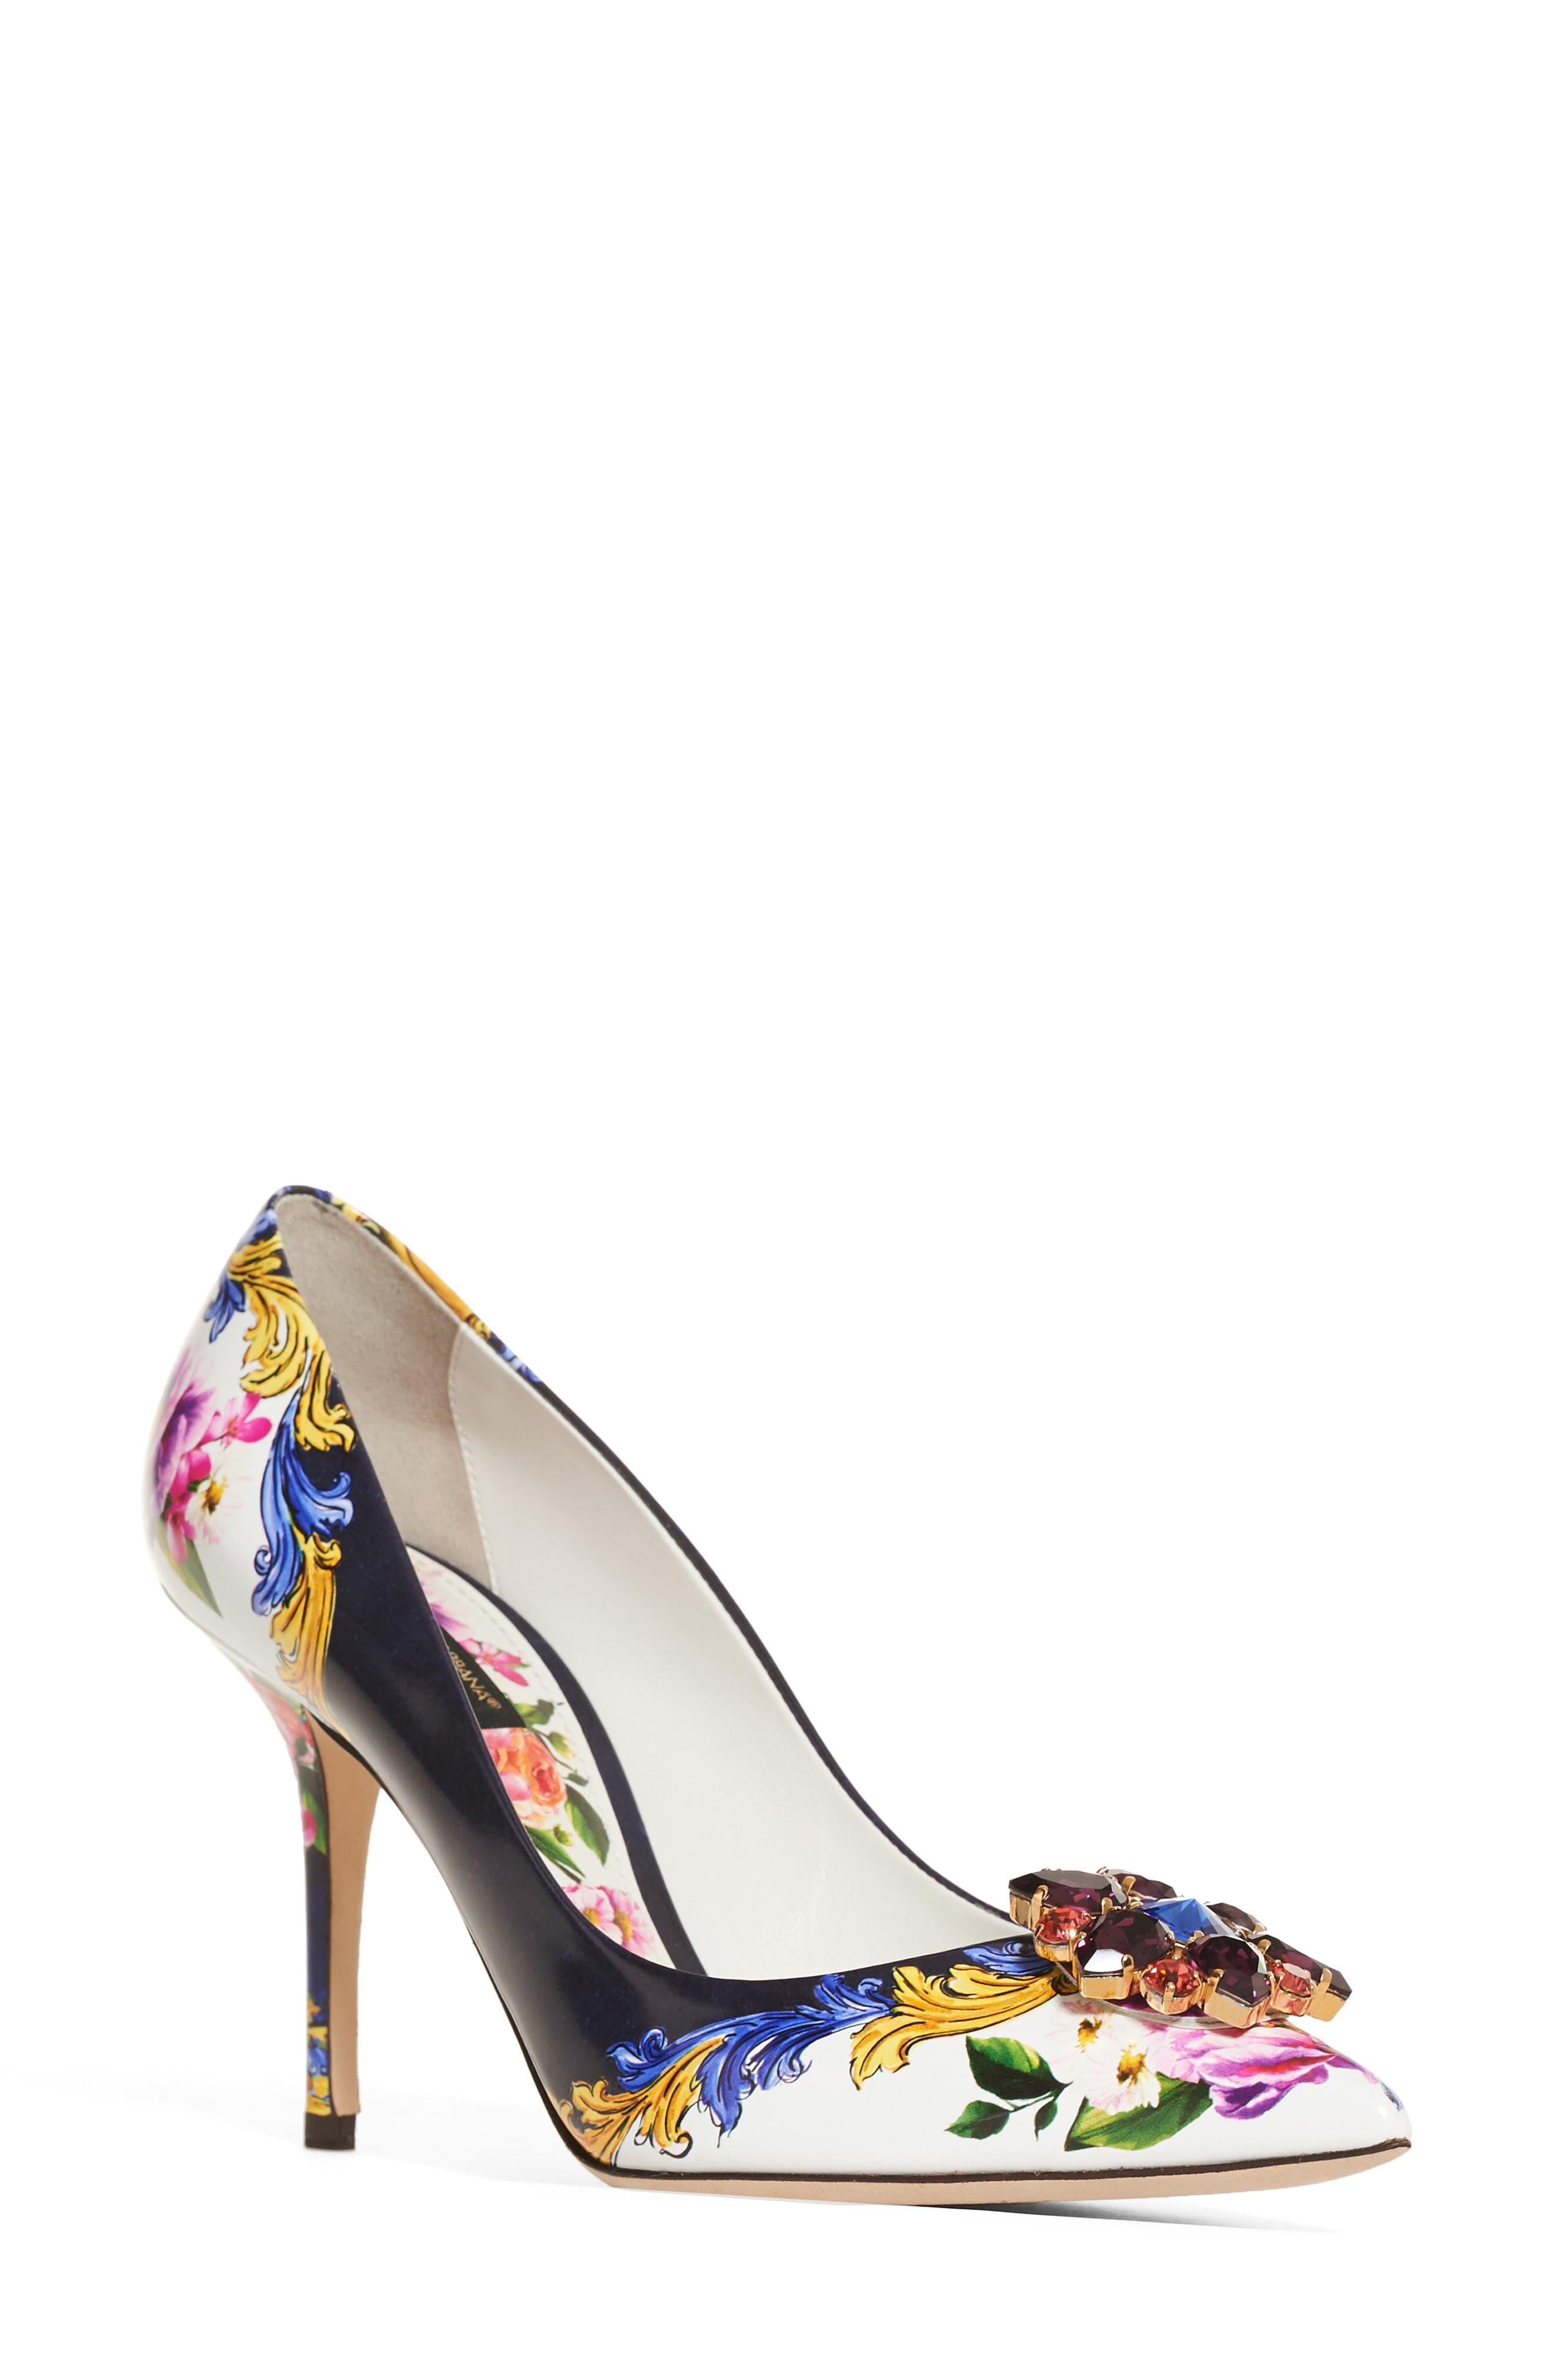 Alternate Image 1 Selected - Dolce & Gabbana Print Pump (Women)